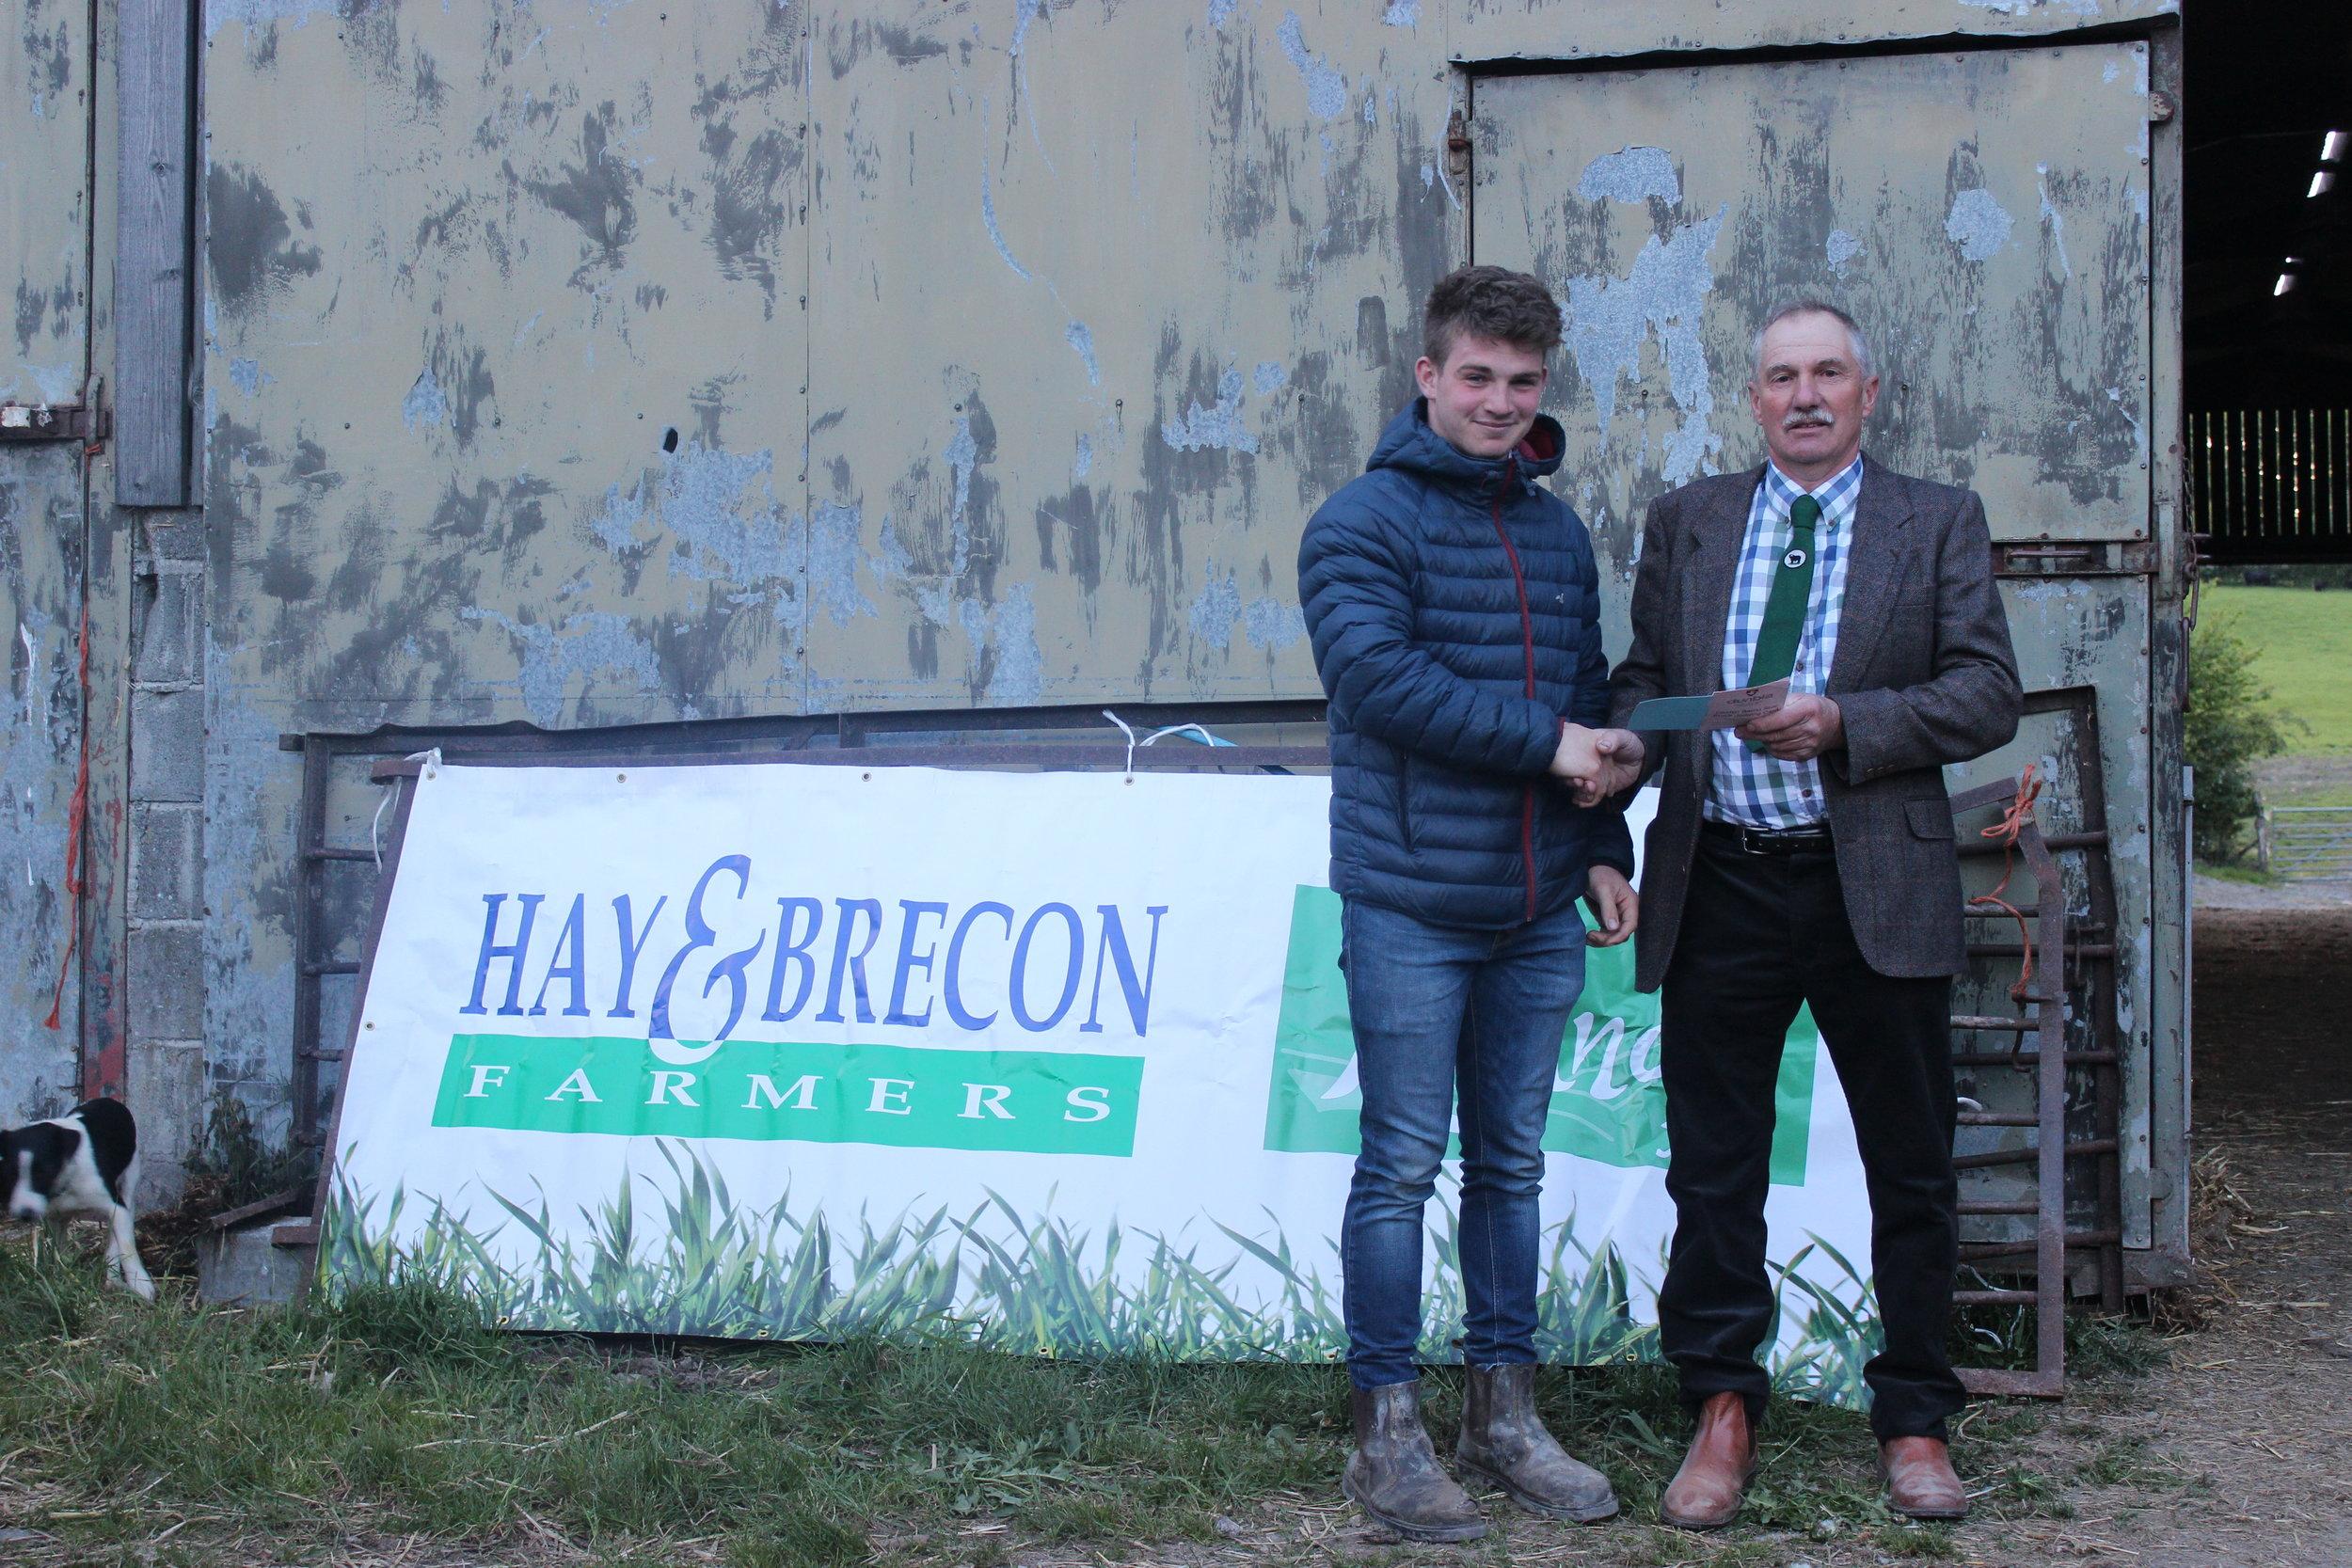 Aeron Powell, Aberedw YFC - 2nd in the Under 21 Welsh Black Cattle Stockjudging with Judge